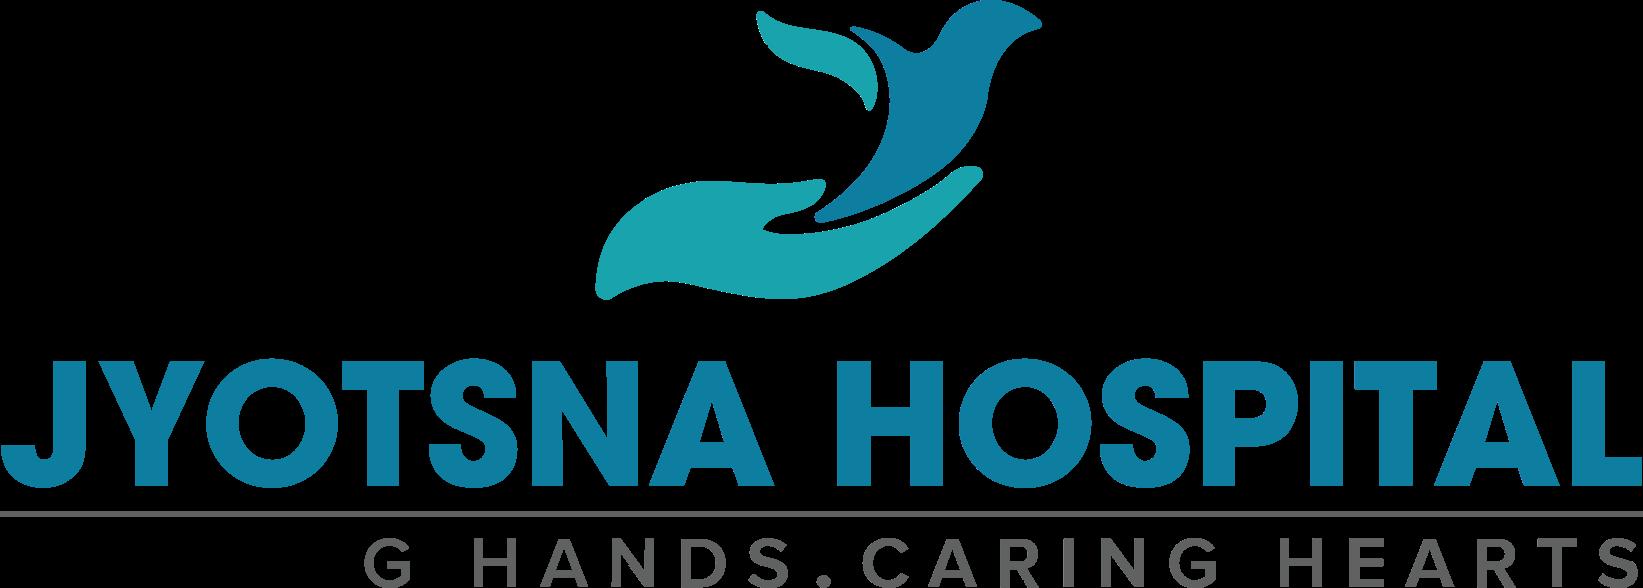 Jyotsna Hospital logo